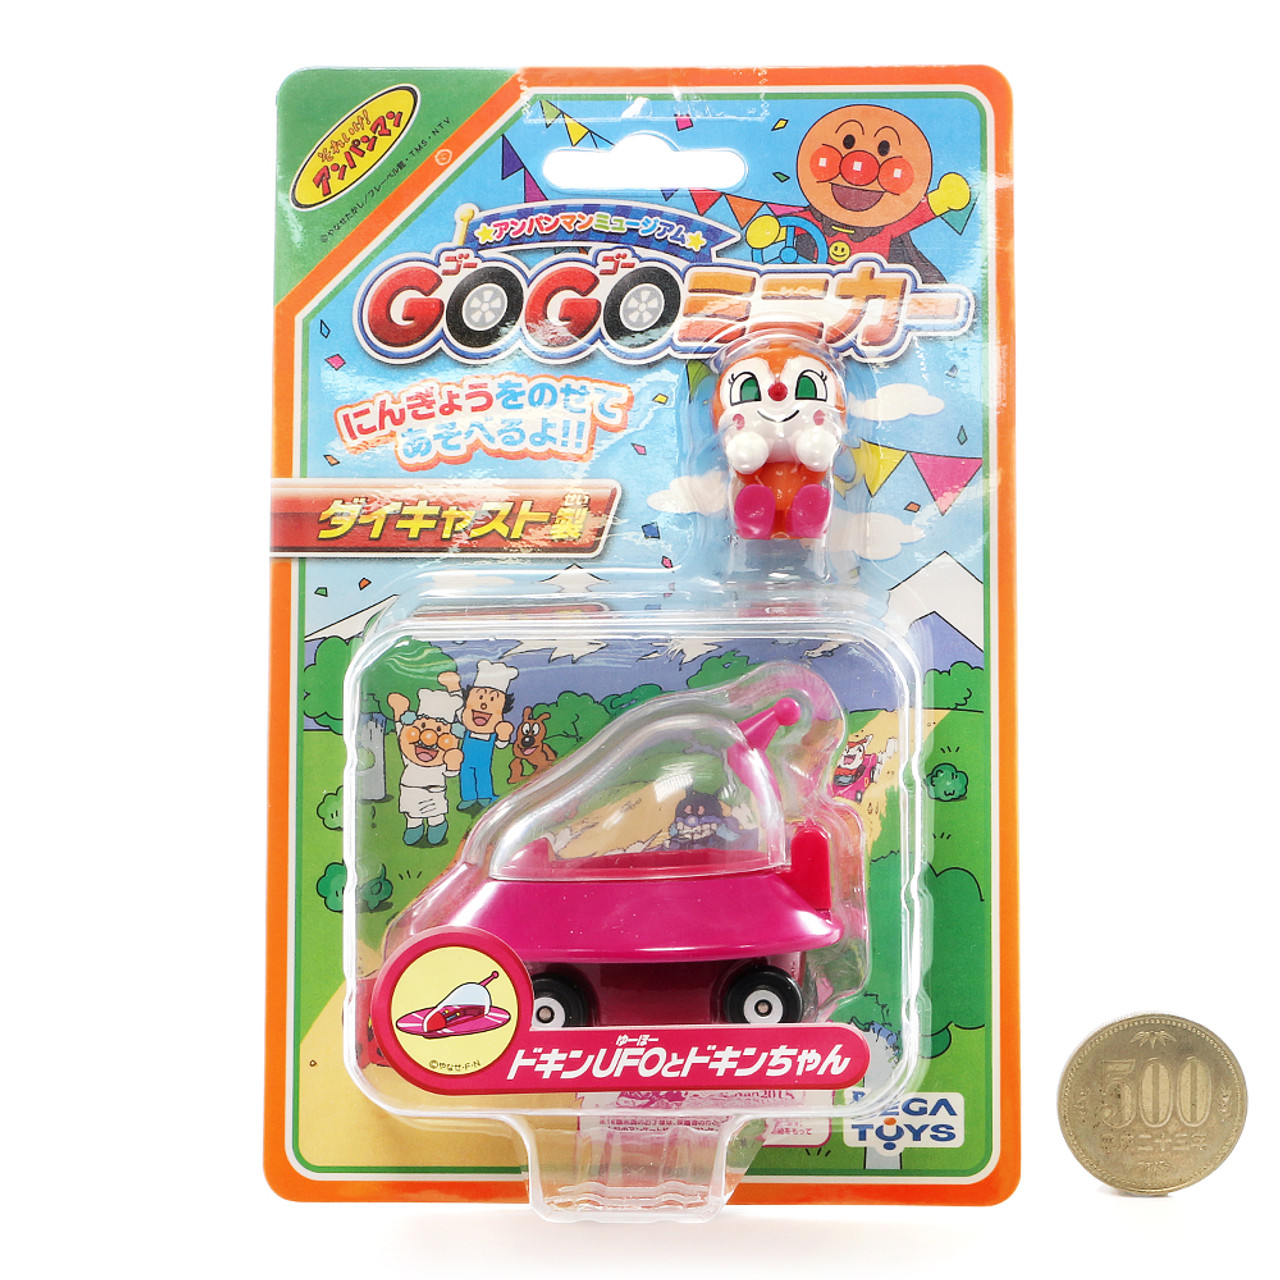 Sega Toys Anpanman Museum Go Go Mini Vehicle Carry Hero - Dokin-chan UFO car ( Proportion )